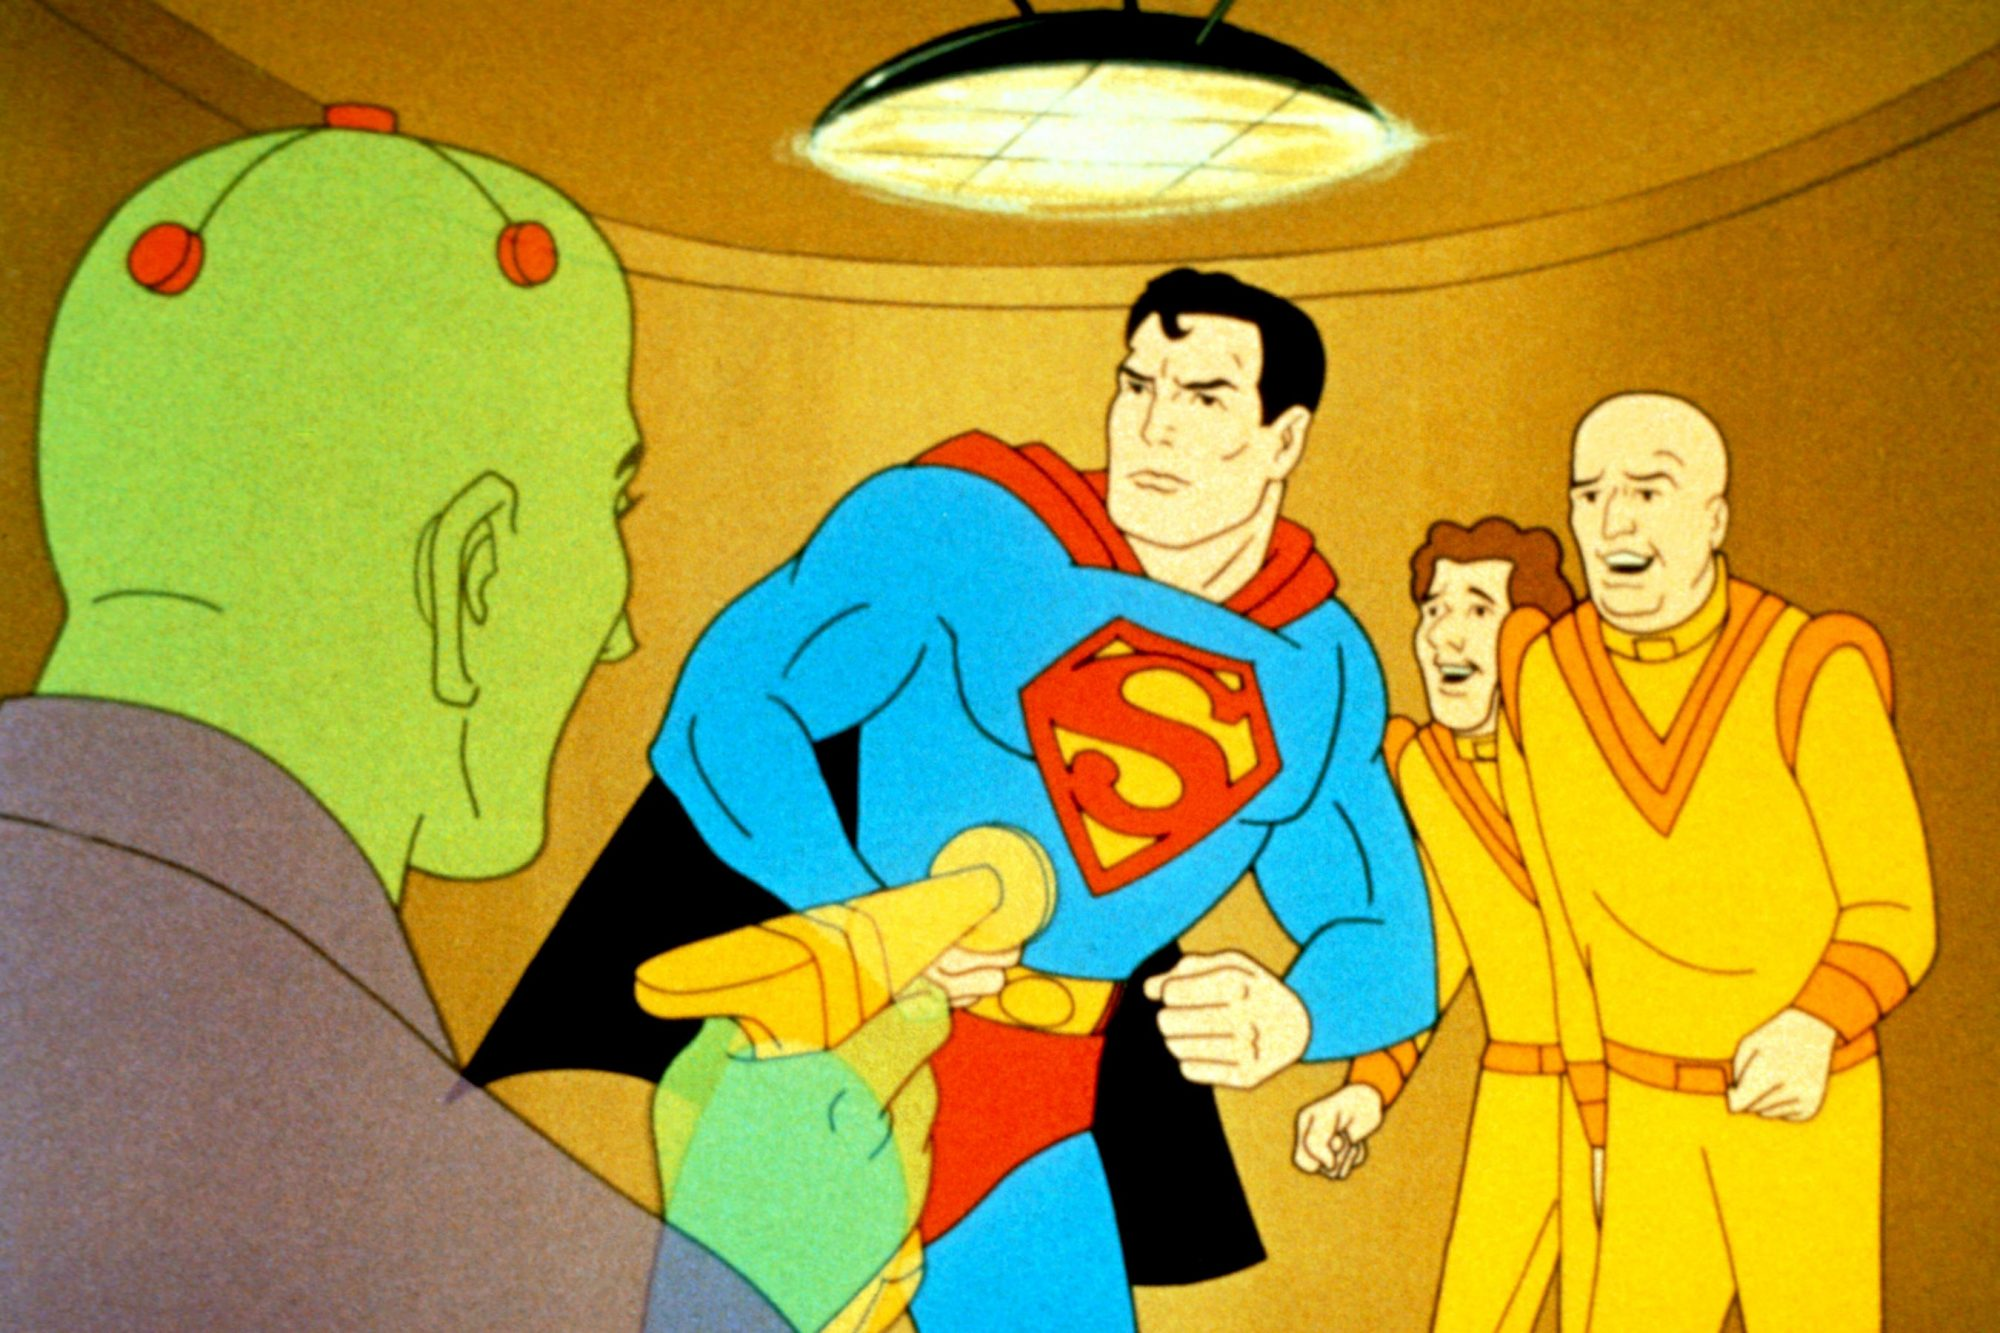 THE NEW ADVENTURES OF SUPERMAN, Superman, 1966-70.